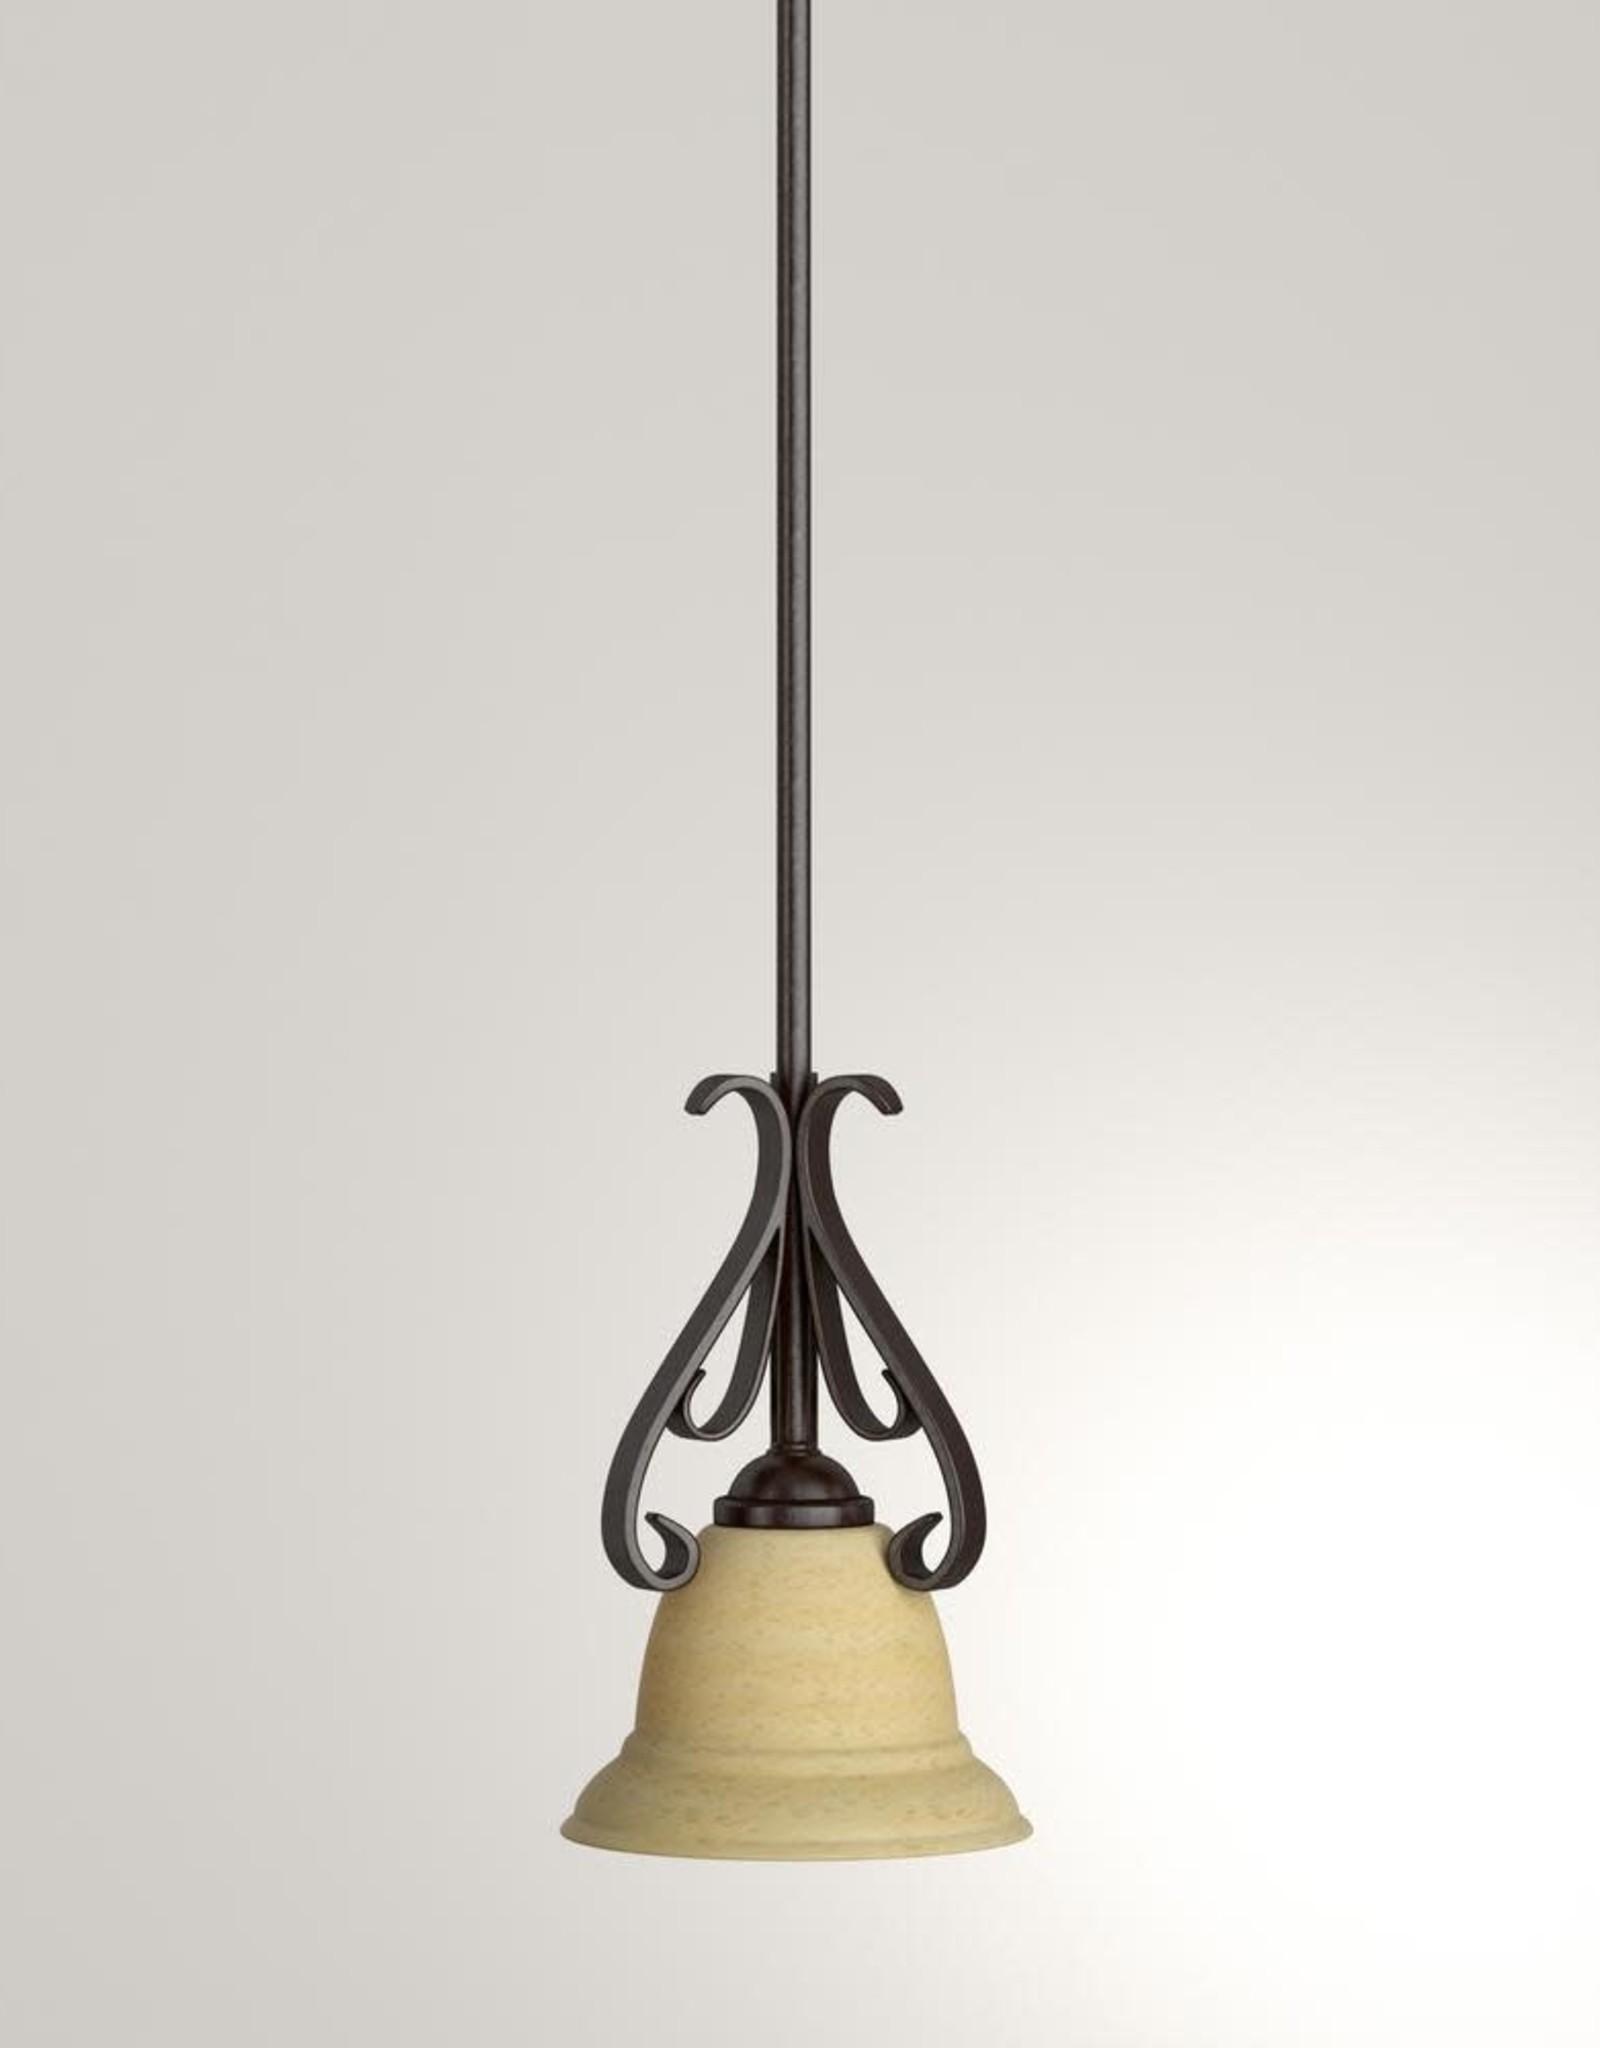 Progress Lighting Torino 1-Light Forged Bronze Kitchen Island Mini Pendant with Tea-Stained Glass